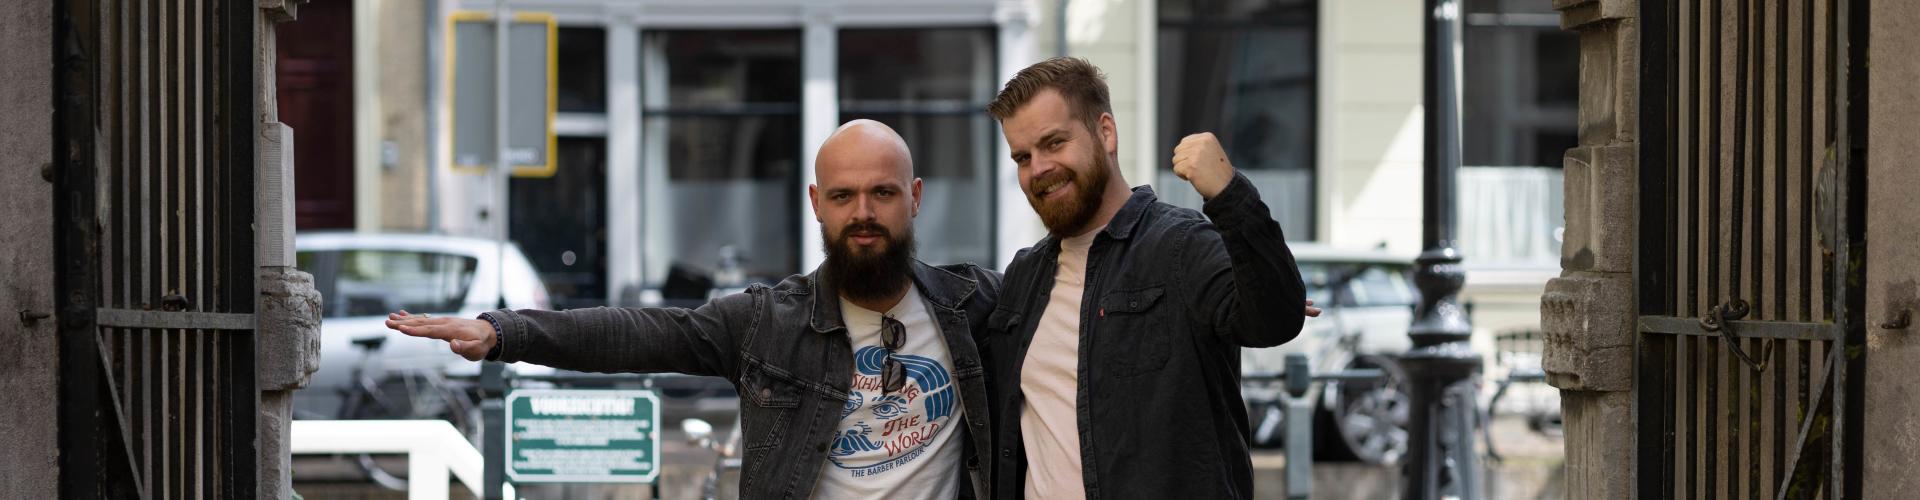 SocialBeardsNL Buck en Sander